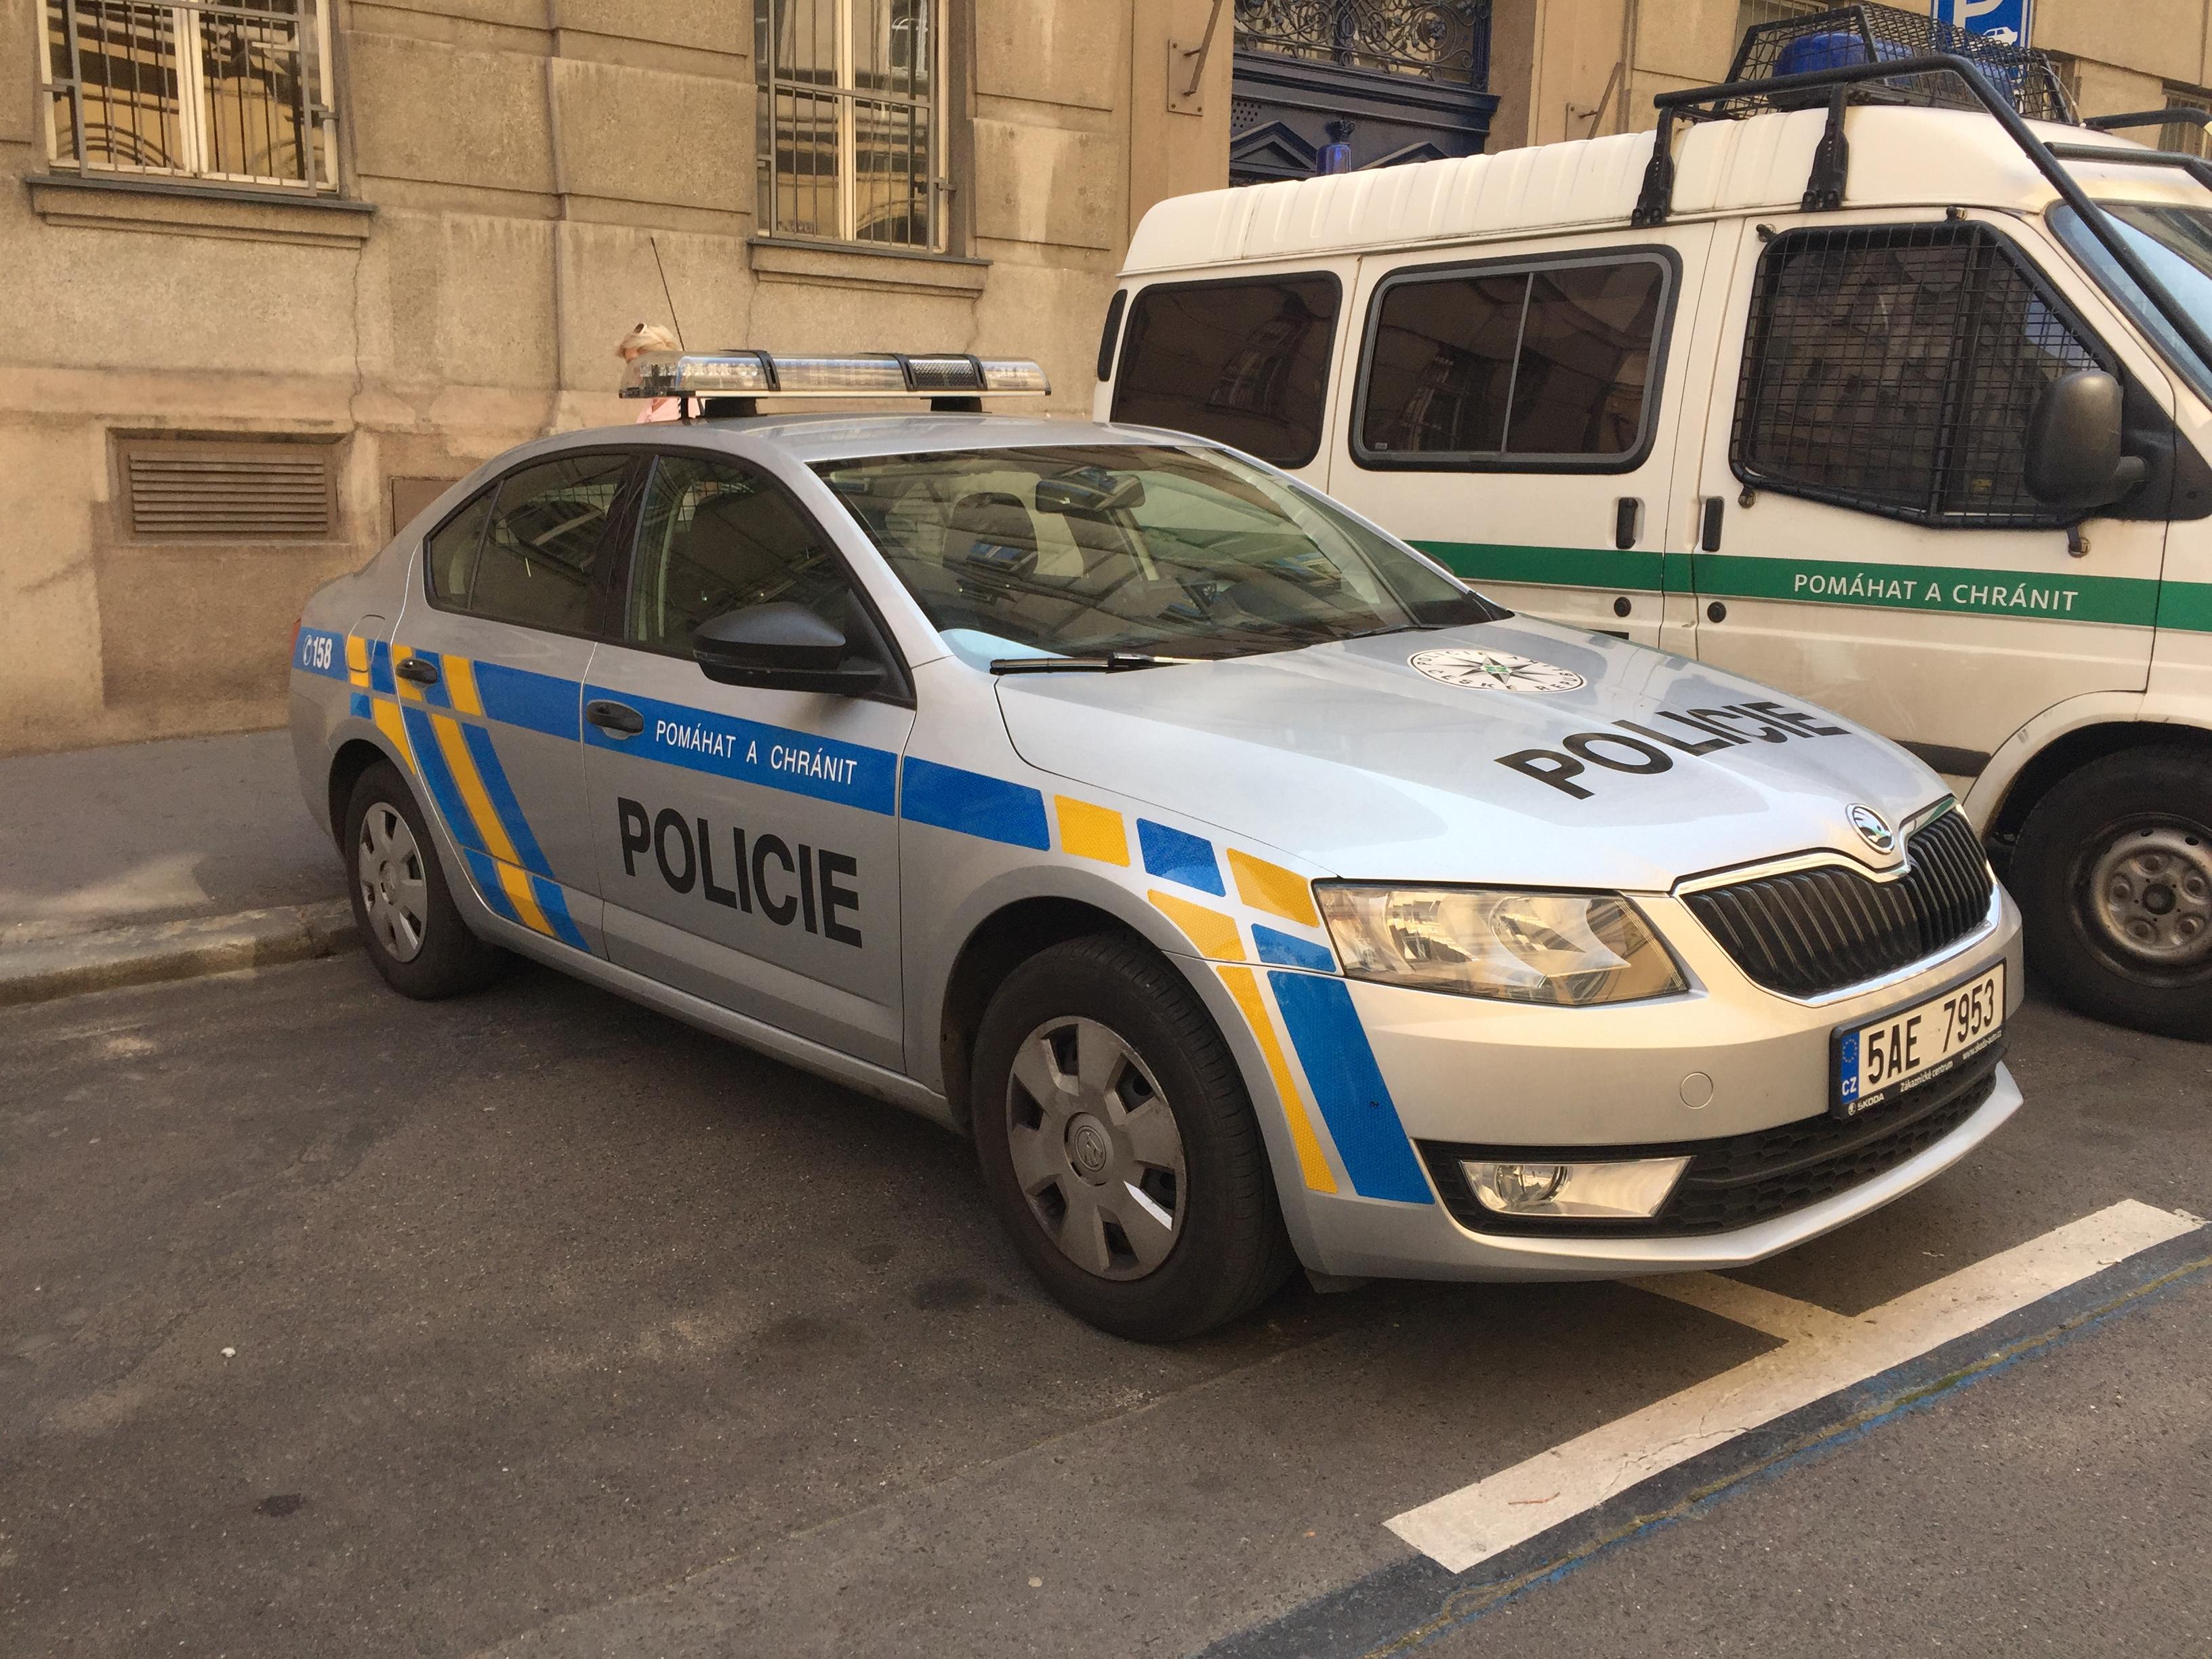 File Police car in Prague Voiture de police dans Prague CZ Praha